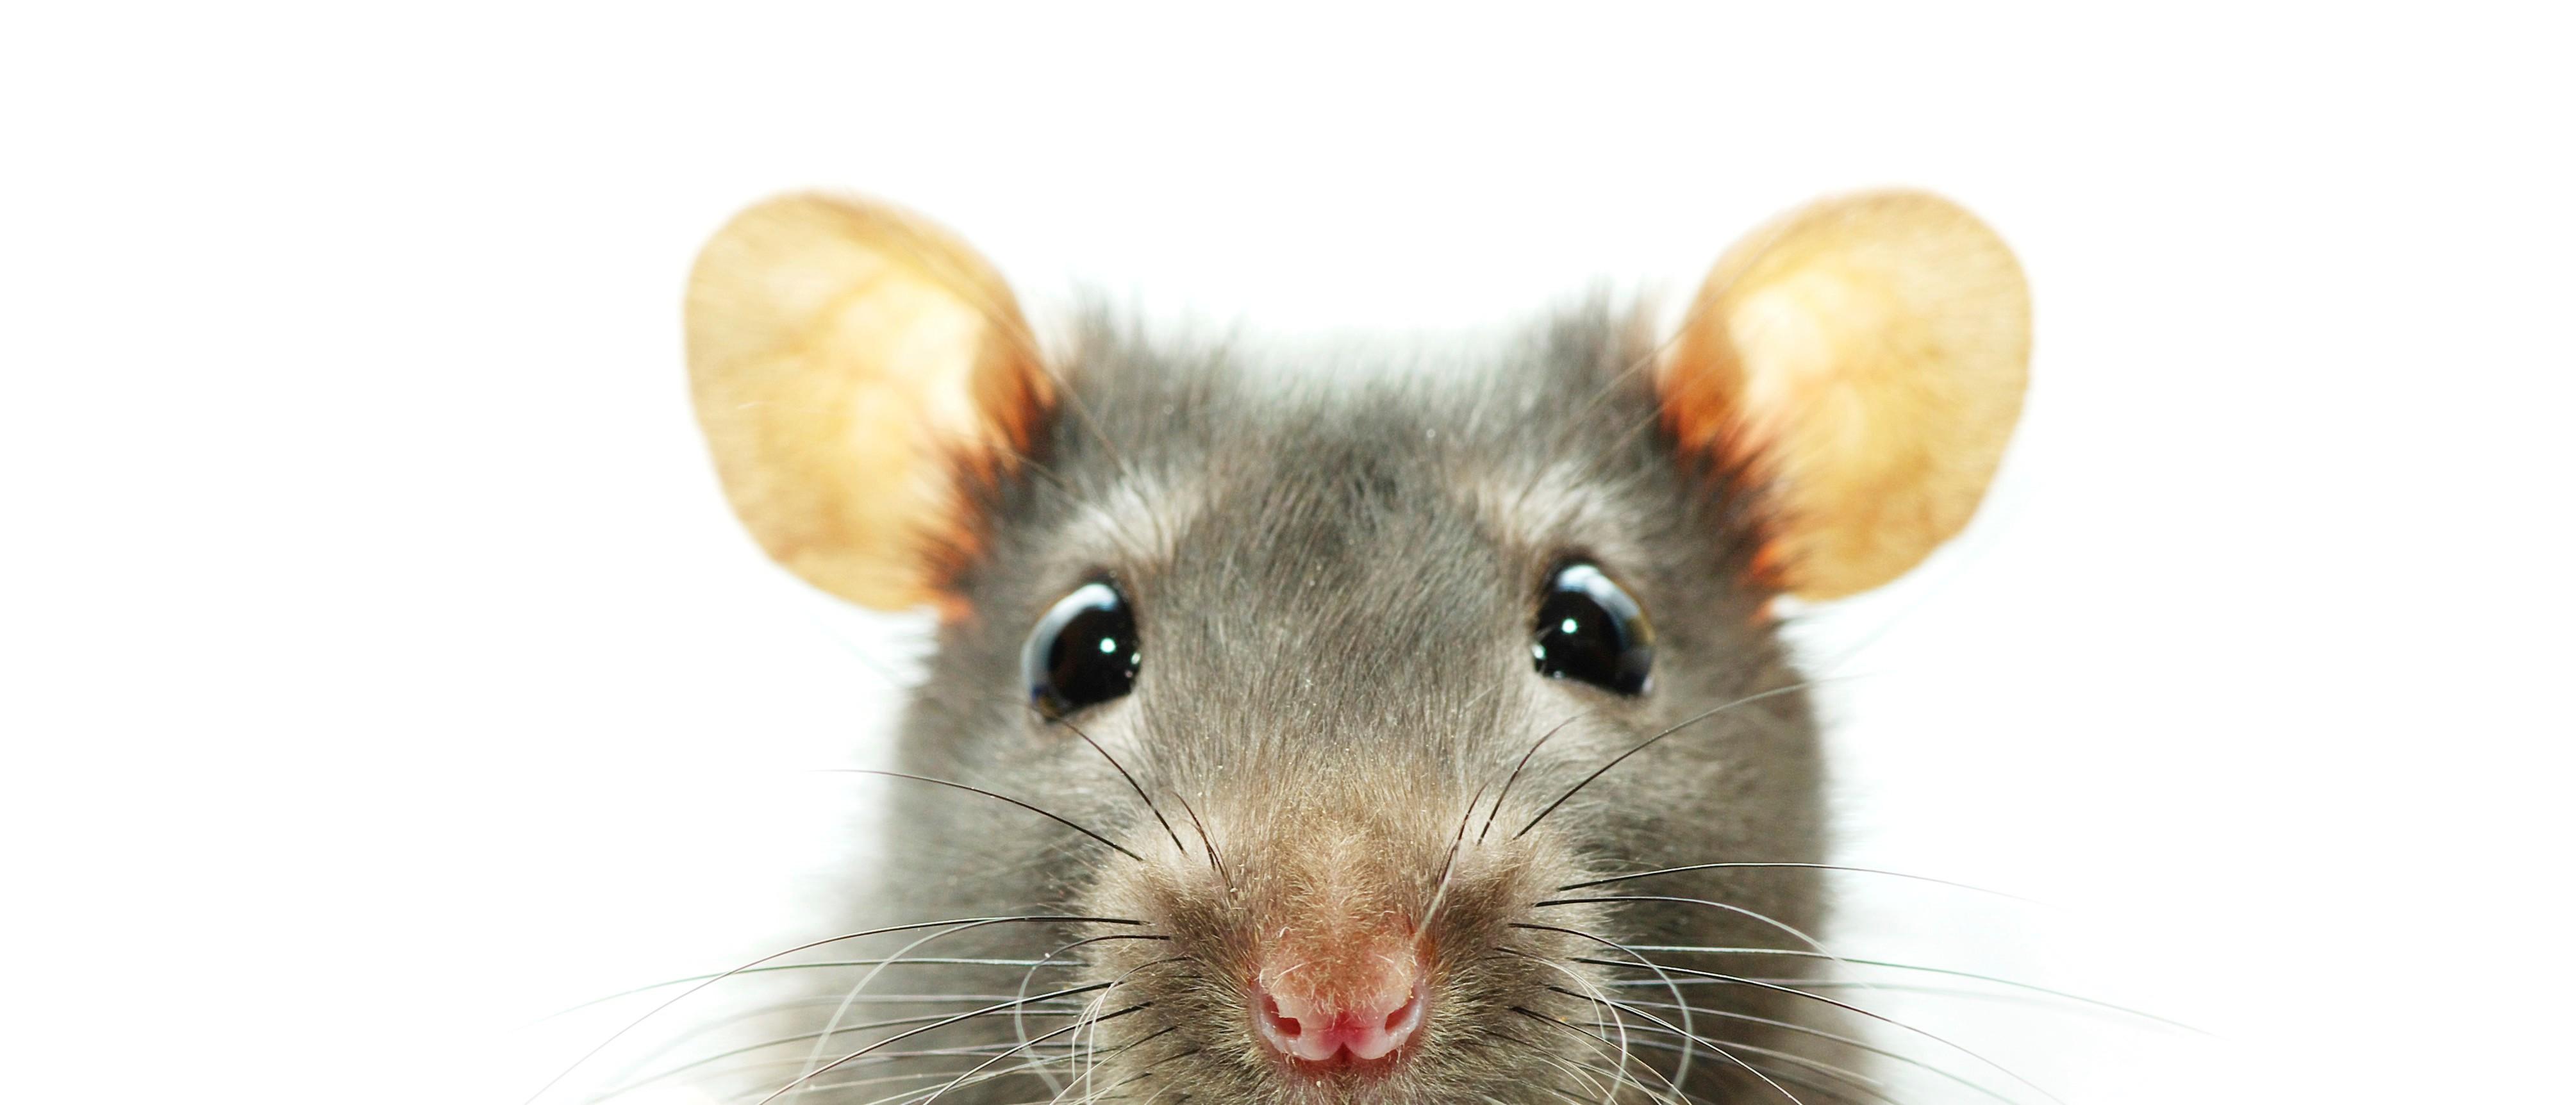 Смешная мышь картинка, картинки апреля